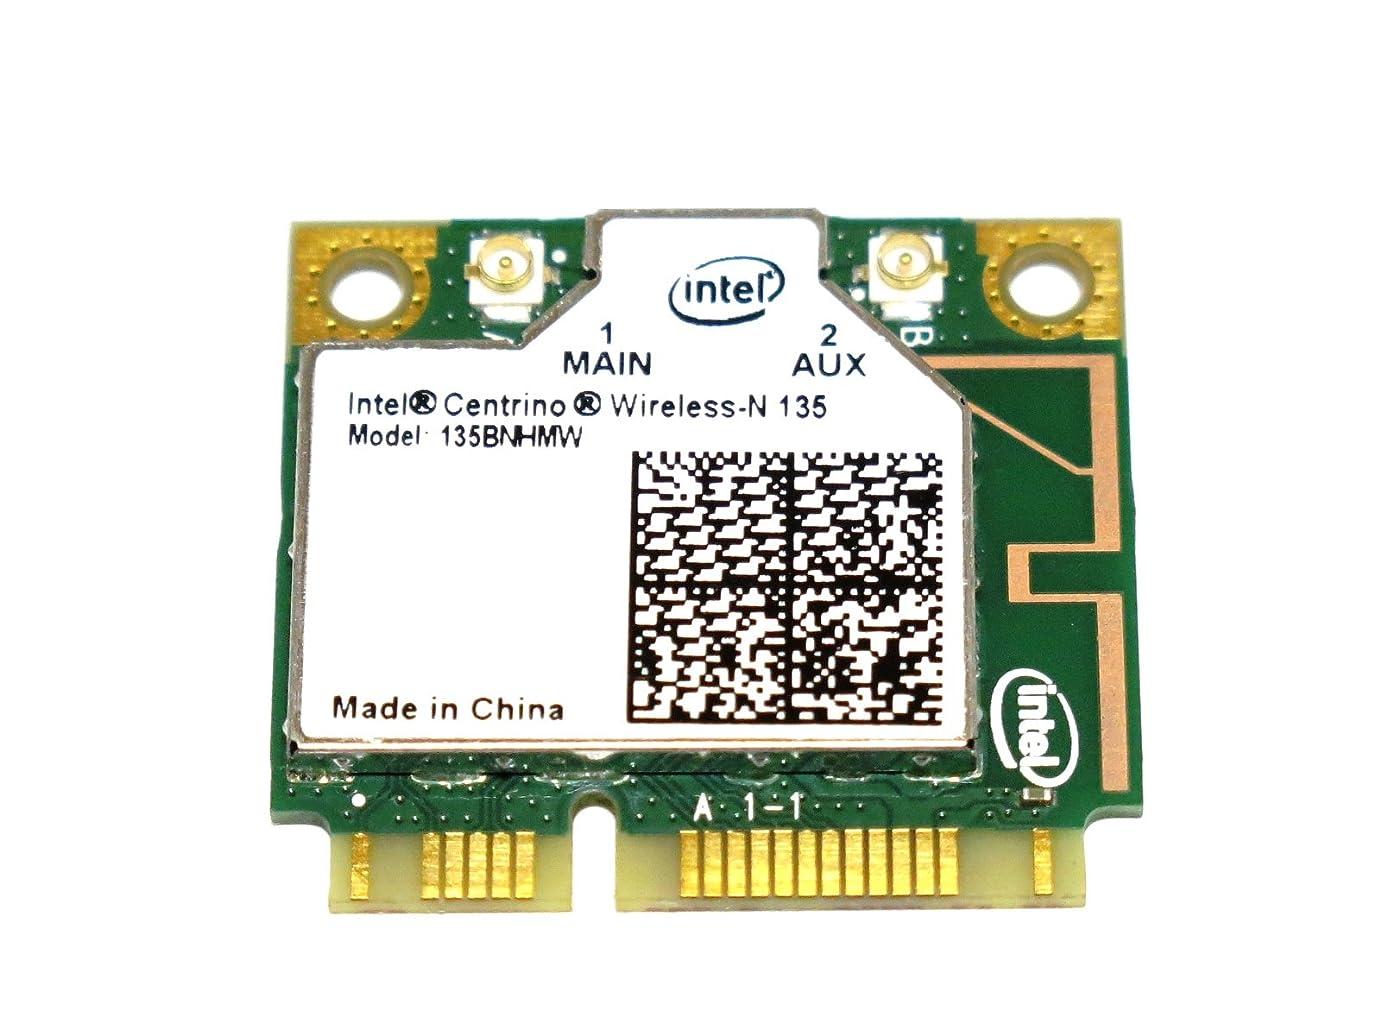 Intel Centrino Wireless-N 135 802.11bgn 150Mbps + Bluetooth 4.0 135BNHMW